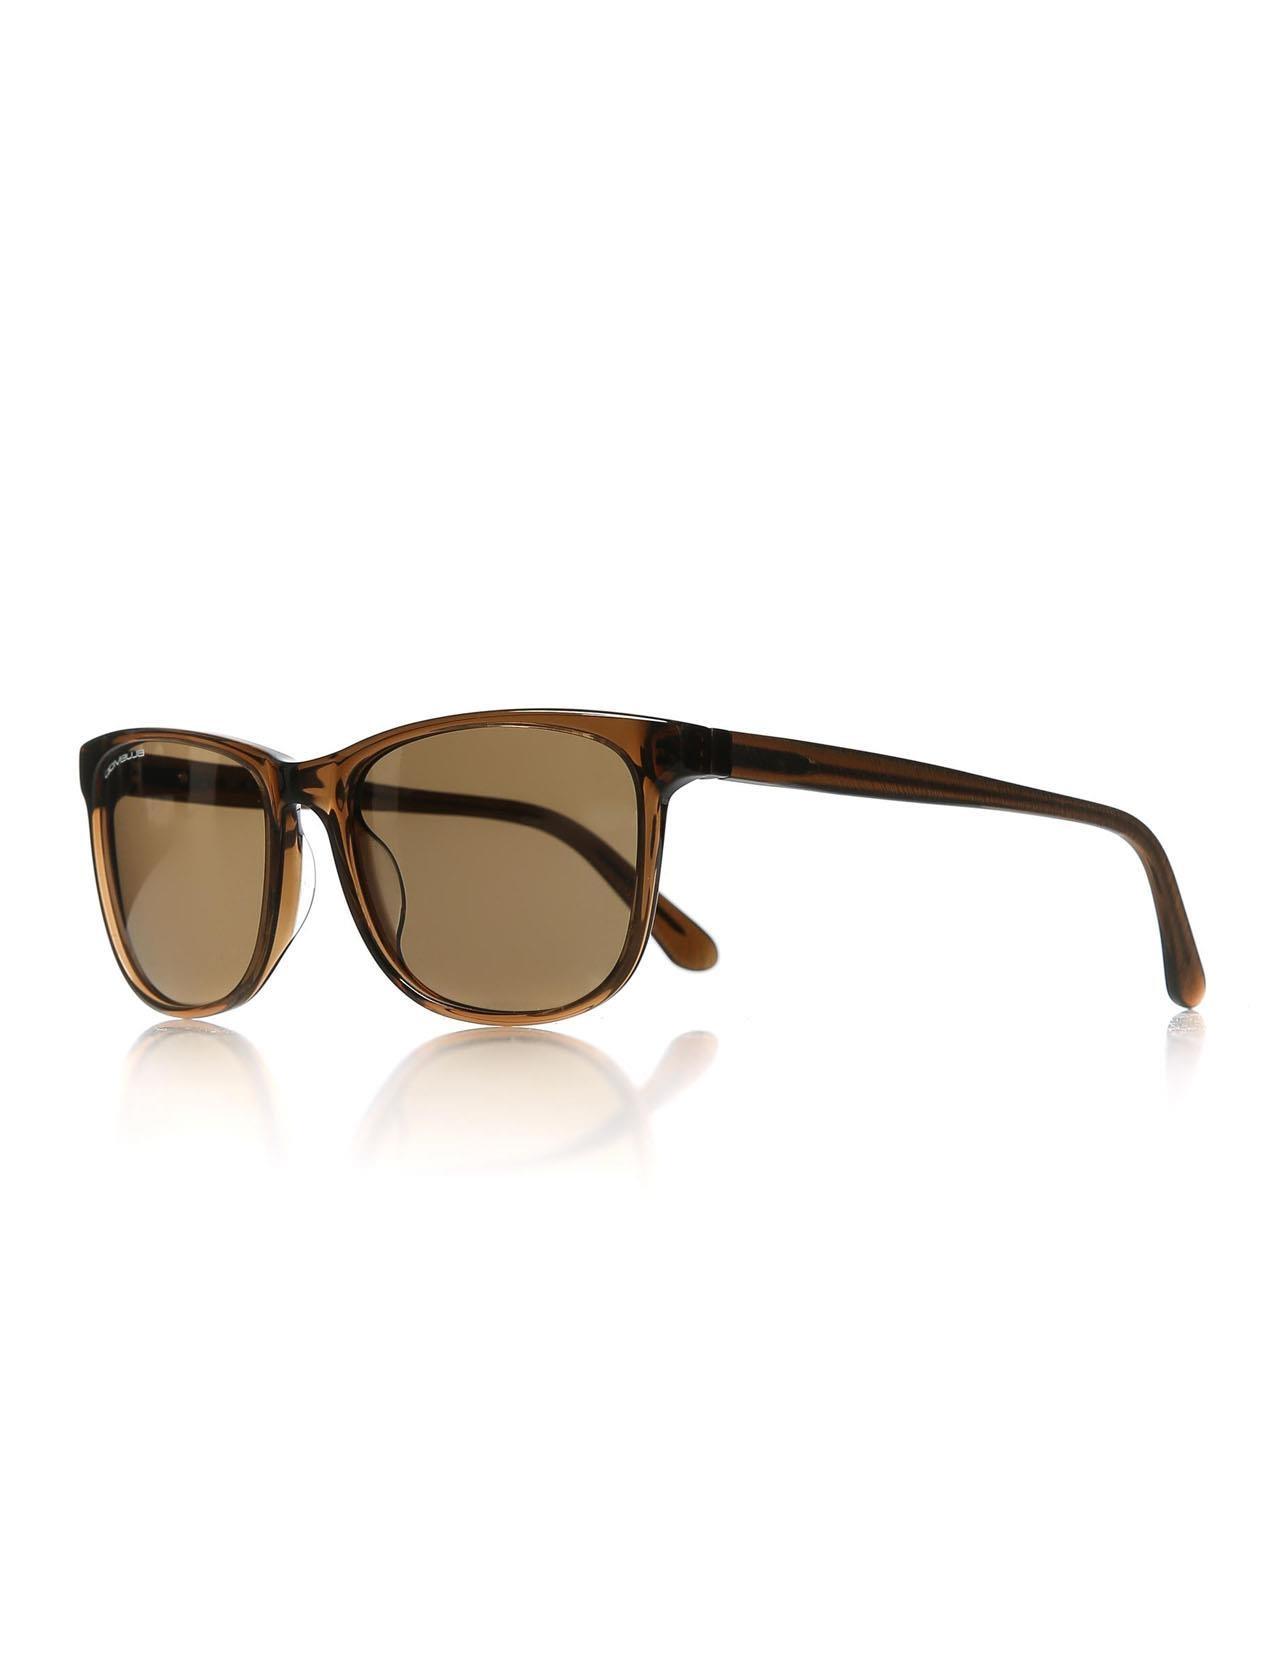 Unisex sunglasses blu bms09 02 55 bone Brown organic rectangle rectangular 55-18-140 tiny